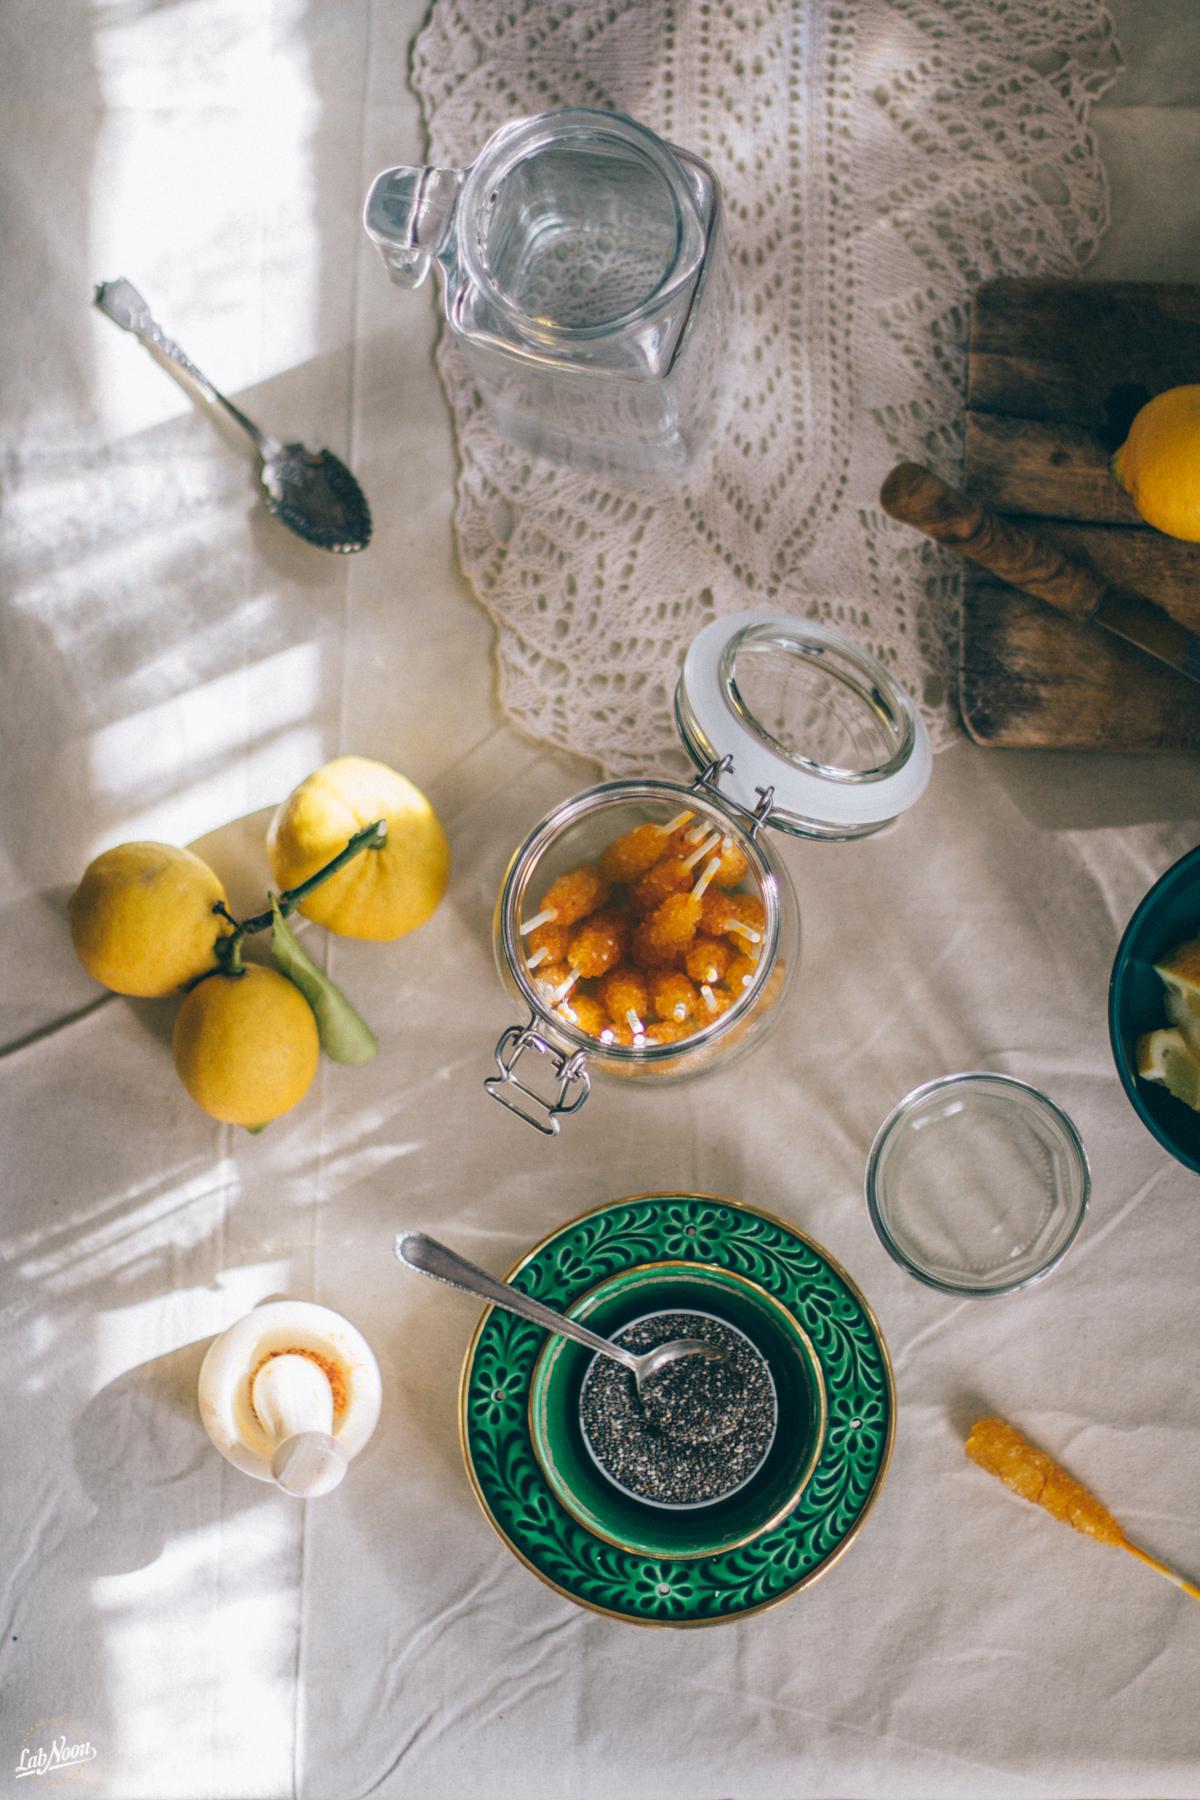 Persian Chia Seeds Drink for Nowruz | Bevanda di Semi di Chia alla Persiana per Nowruz | Lab Noon #PFBNowruz-11